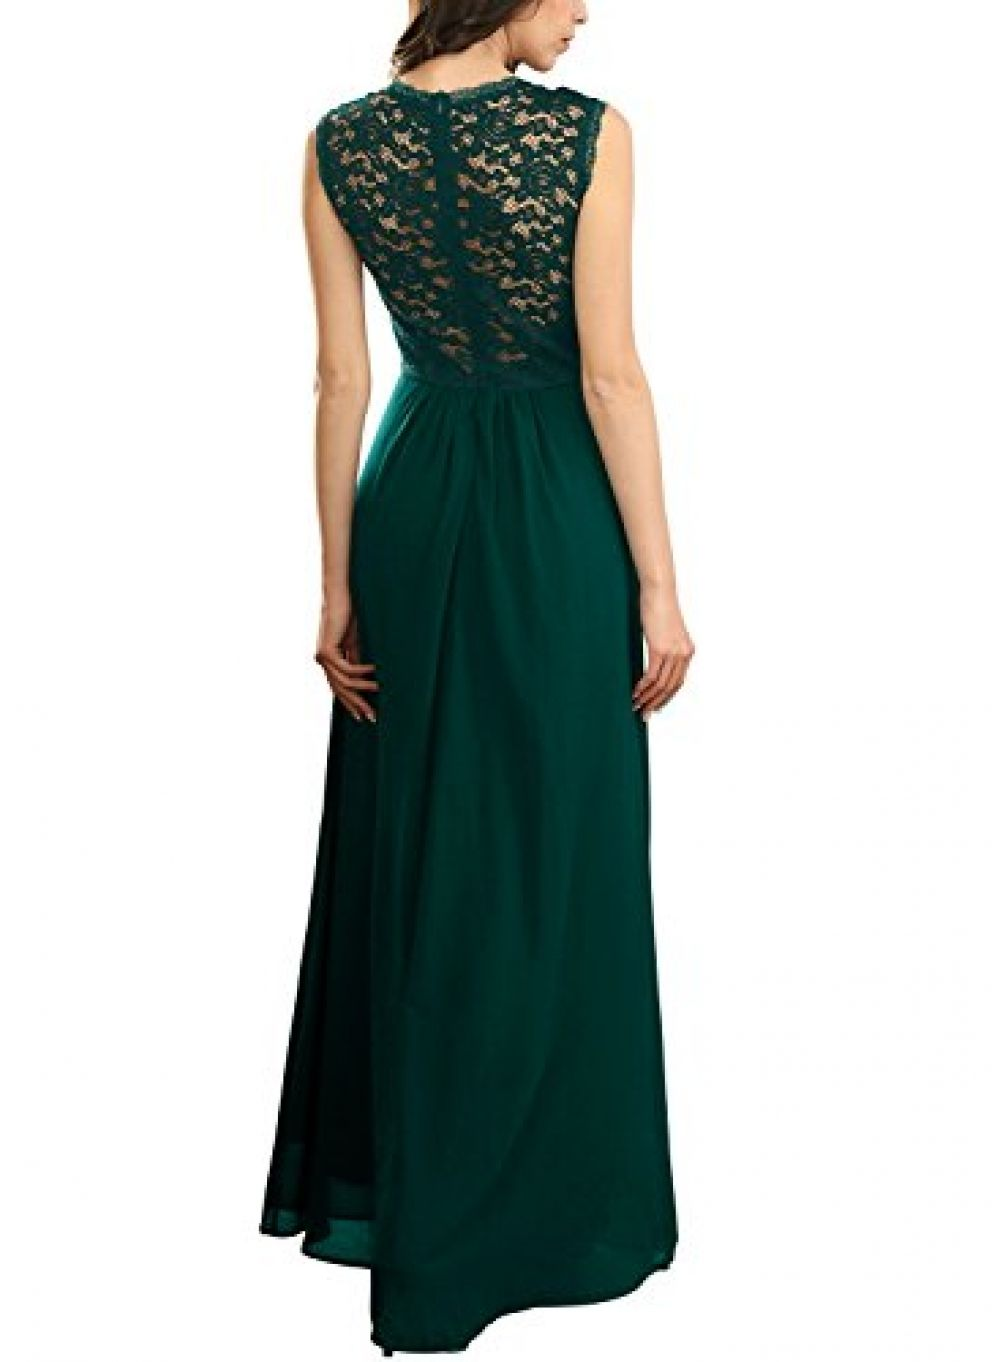 Miusol womenus casual deep v neck sleeveless vintage wedding maxi